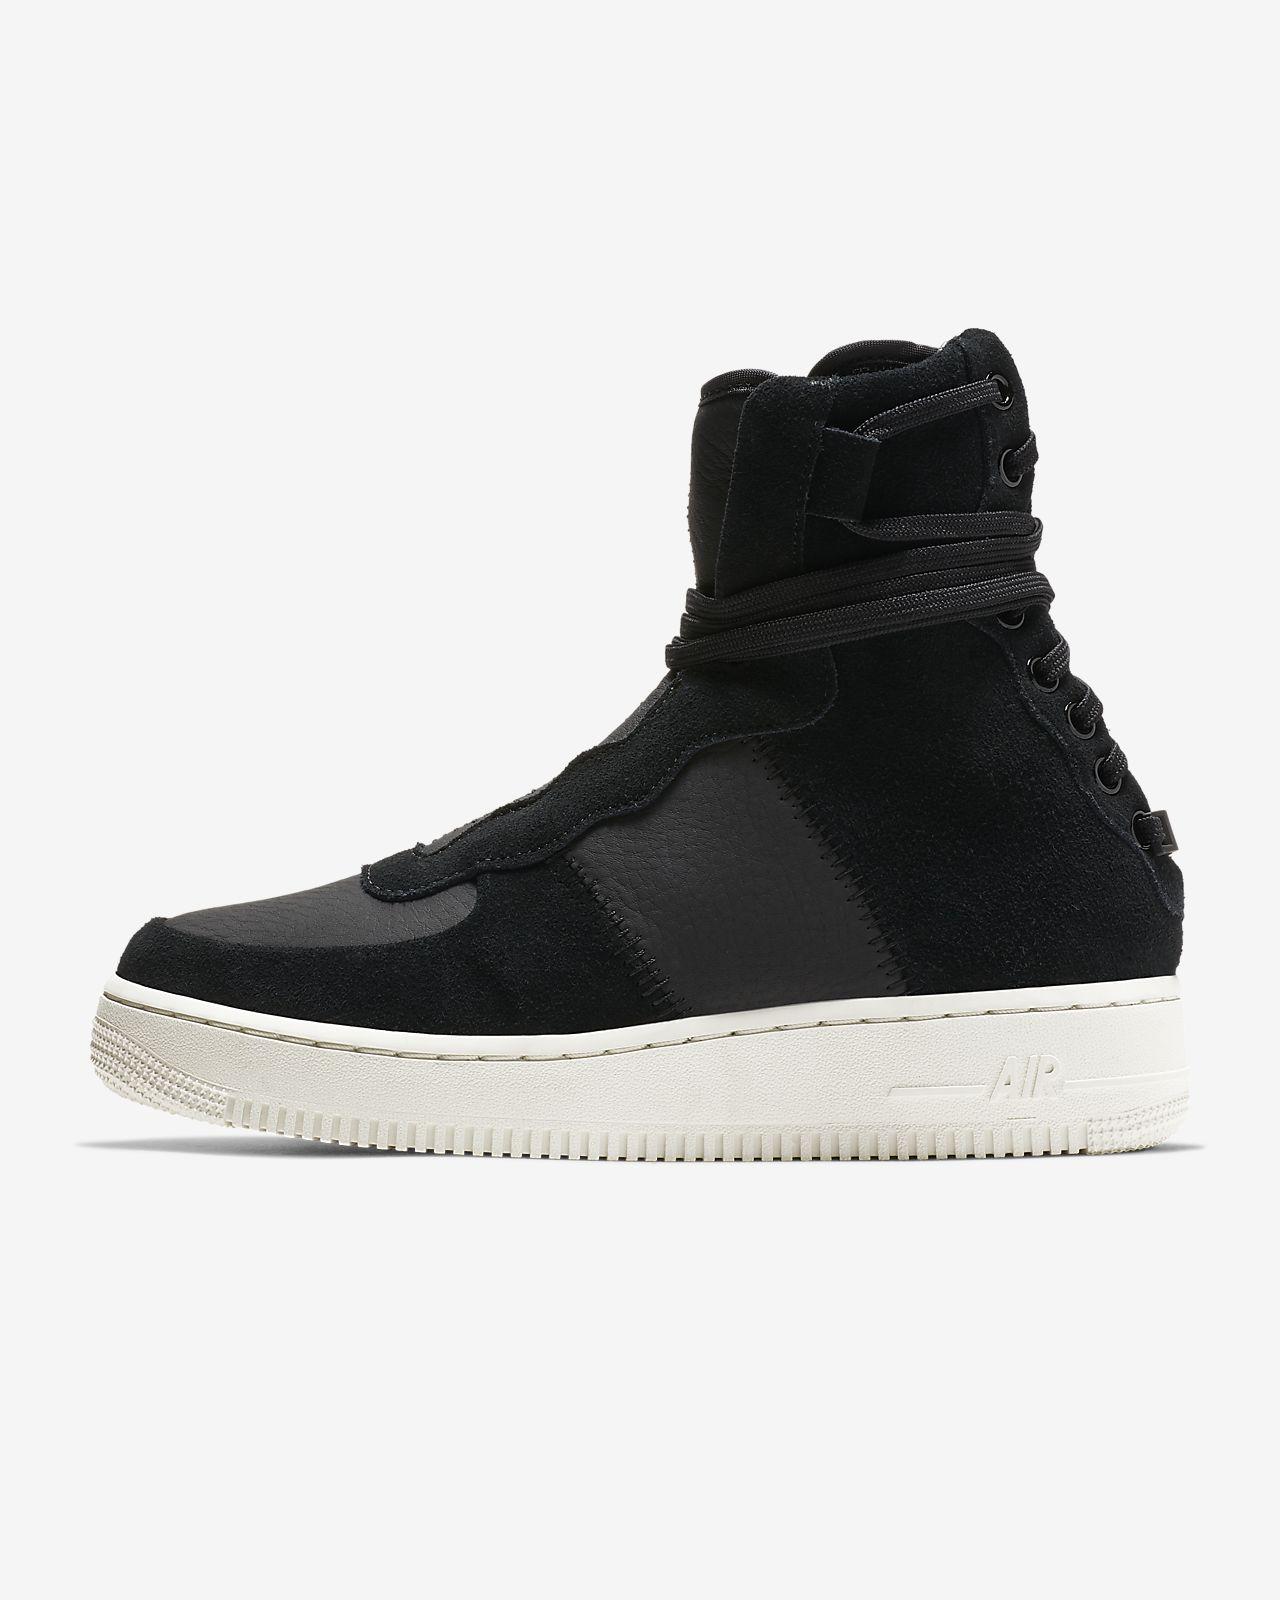 Nike Air Force 1 Rebel XX Premium Damenschuh